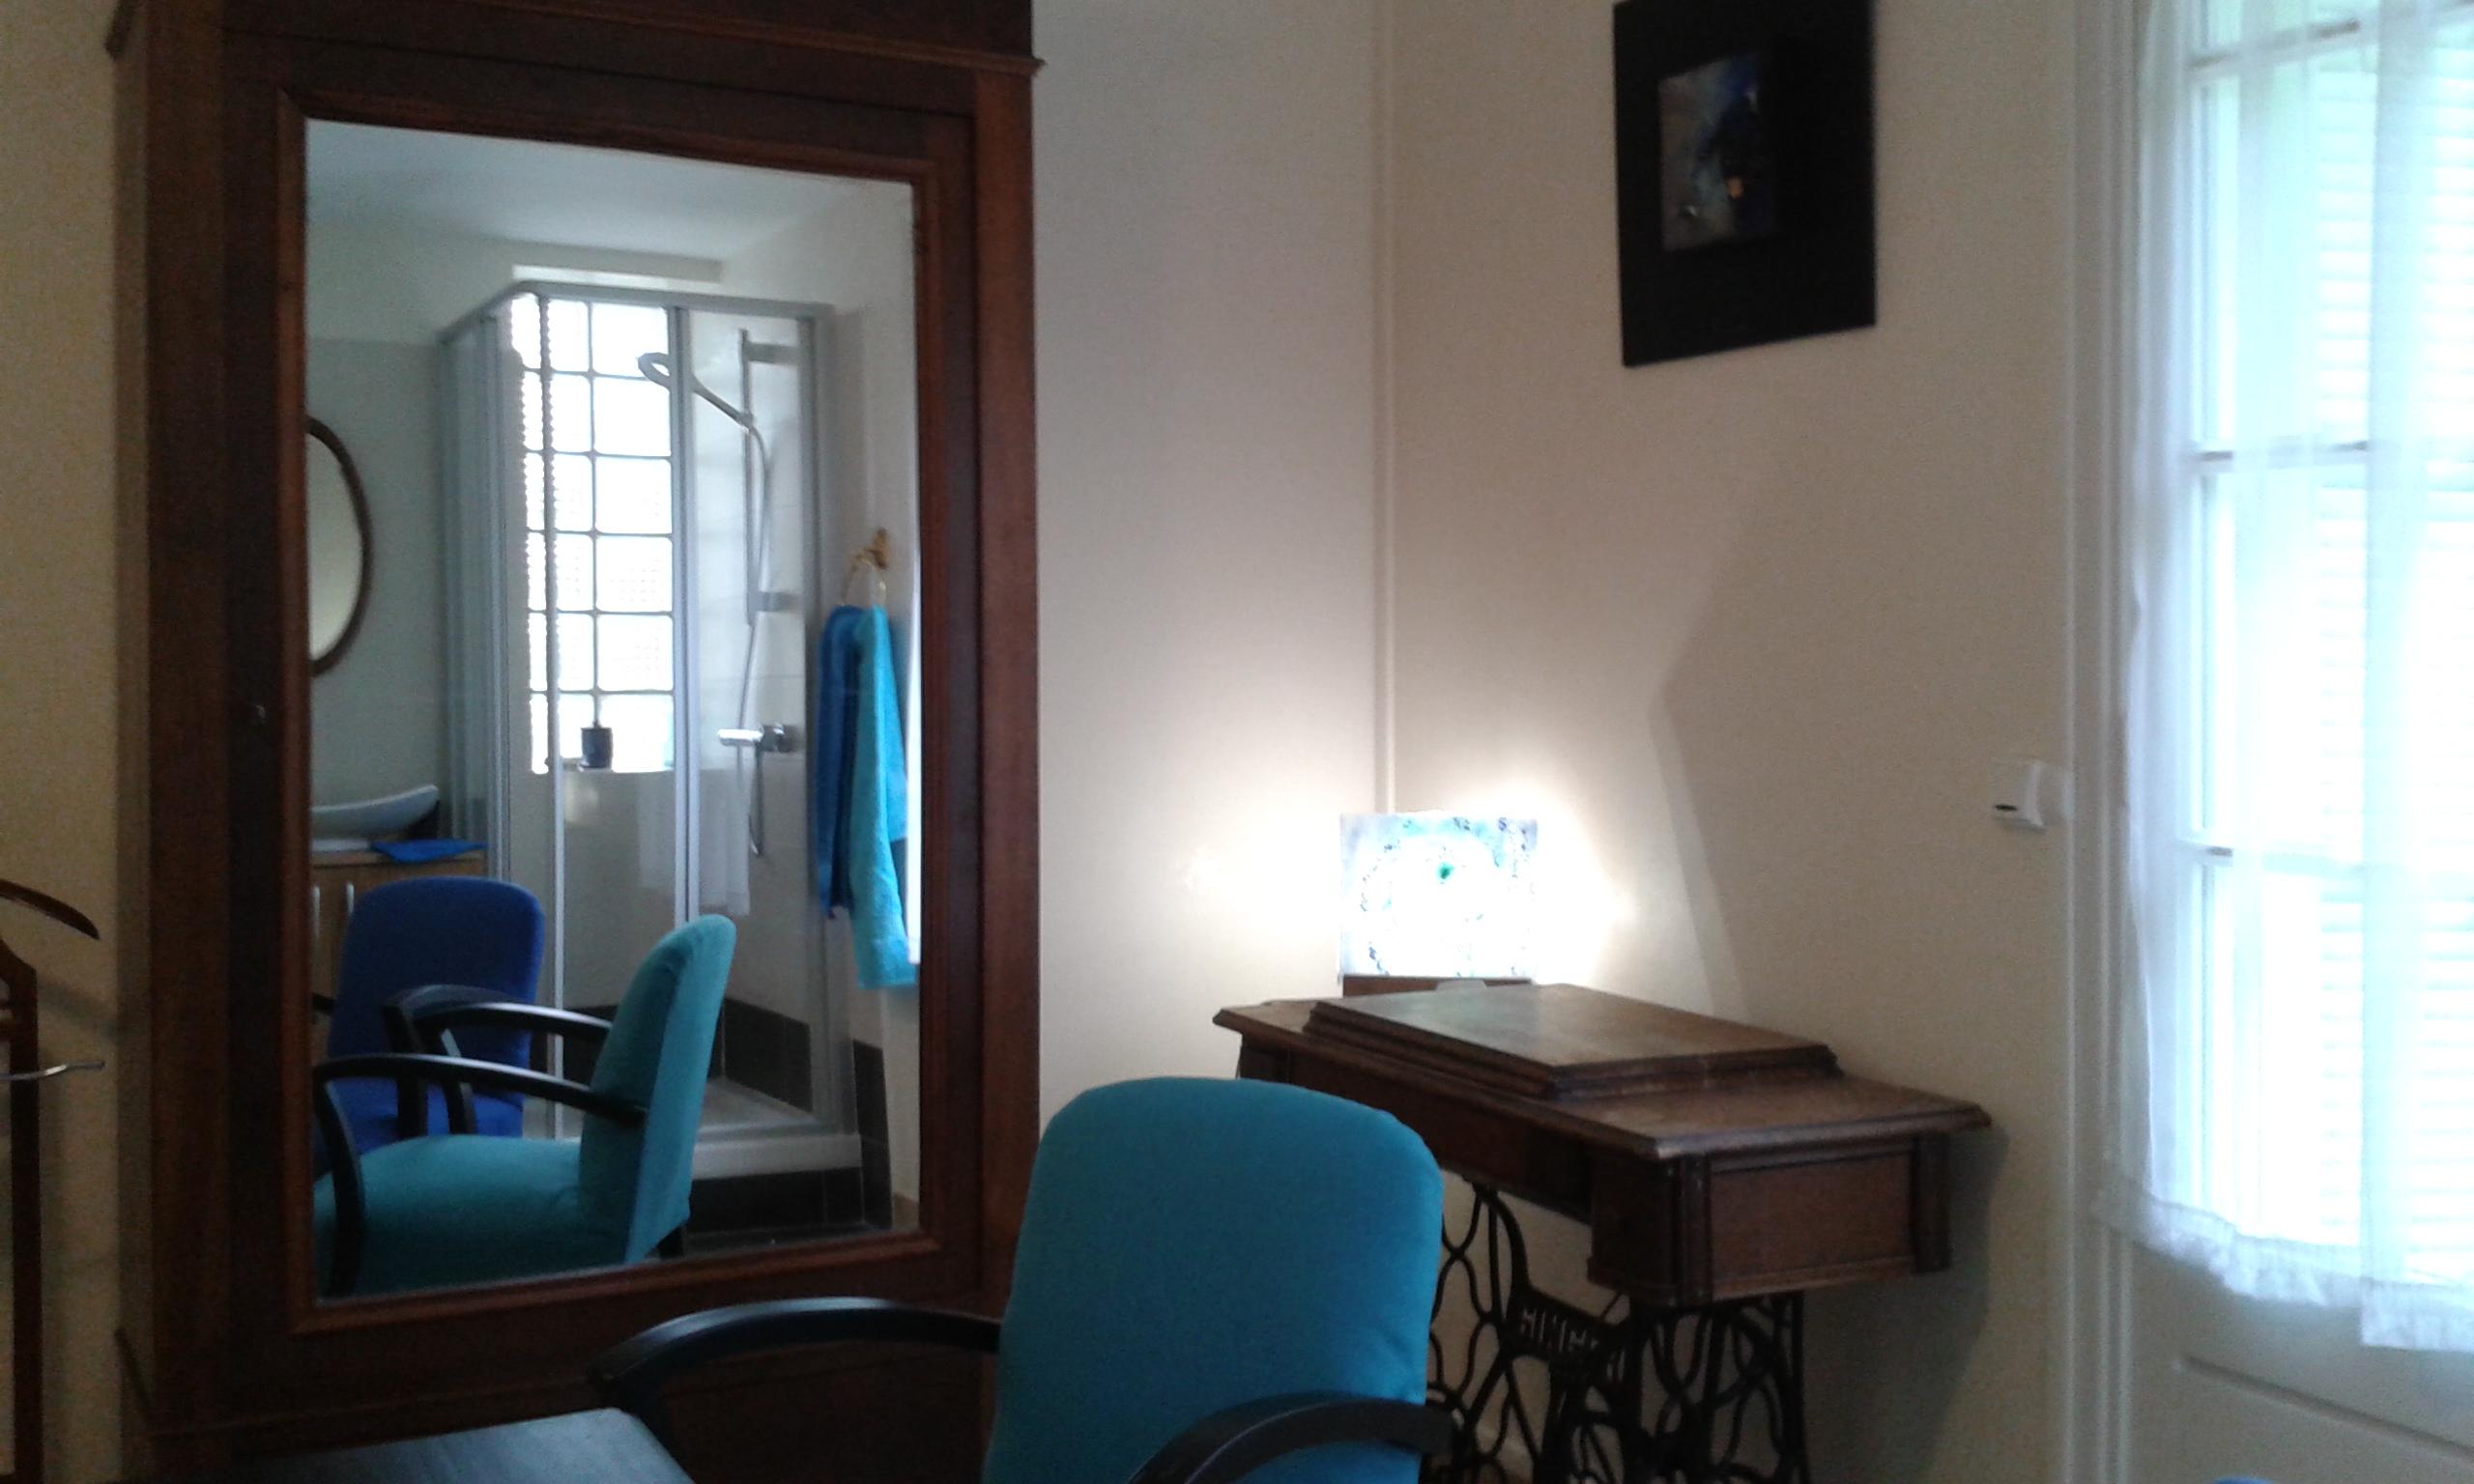 Chambre indigo chambres d 39 h tes de charme aix en provence for Chambre de charme provence